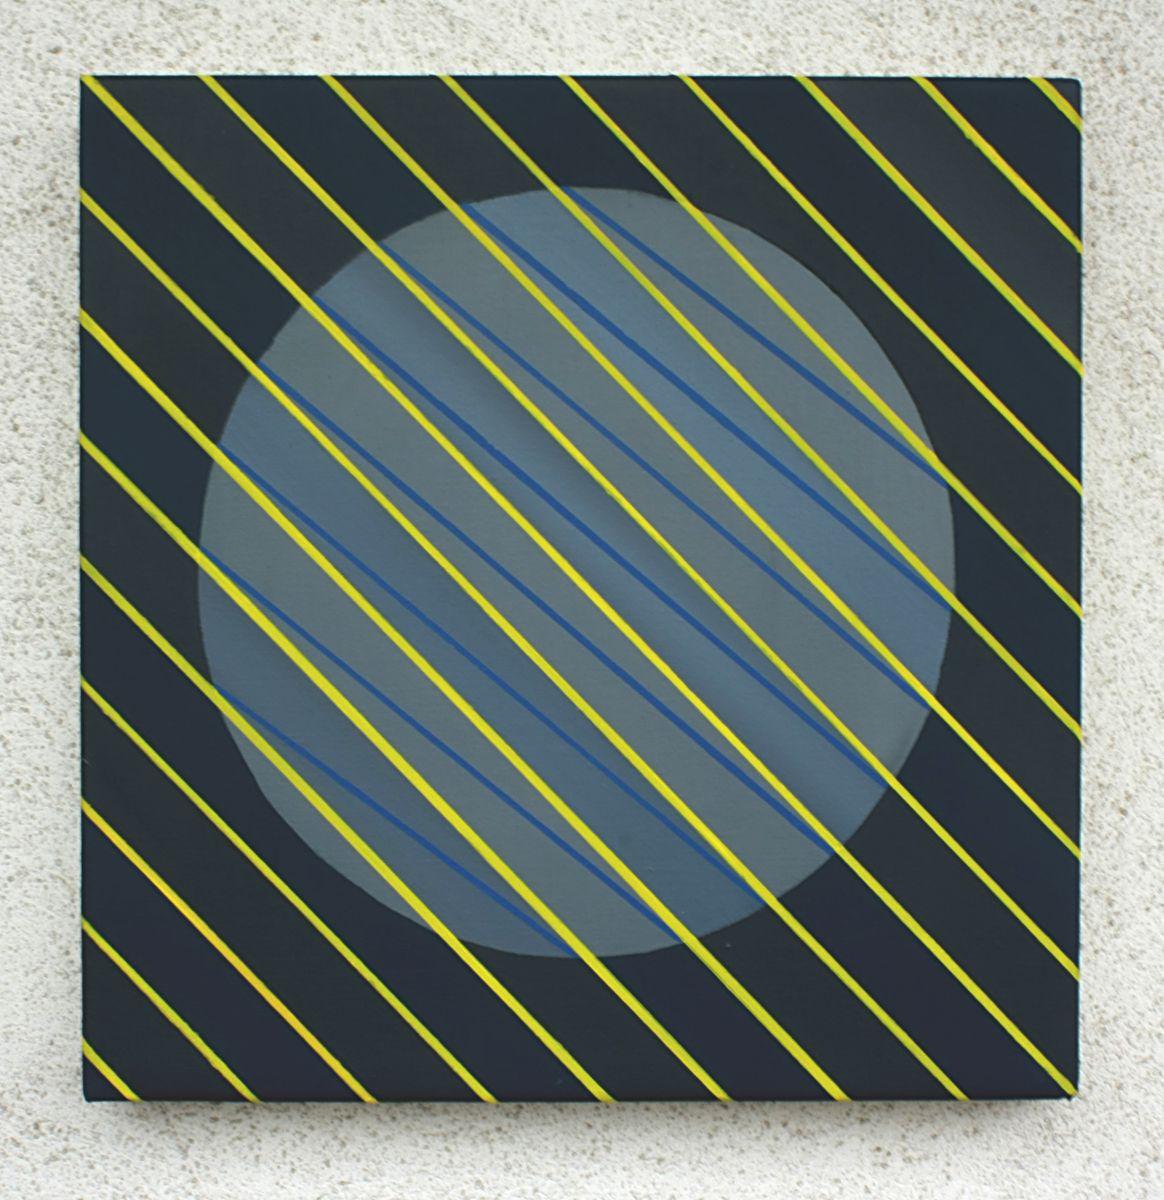 Diagonalen-Kreis